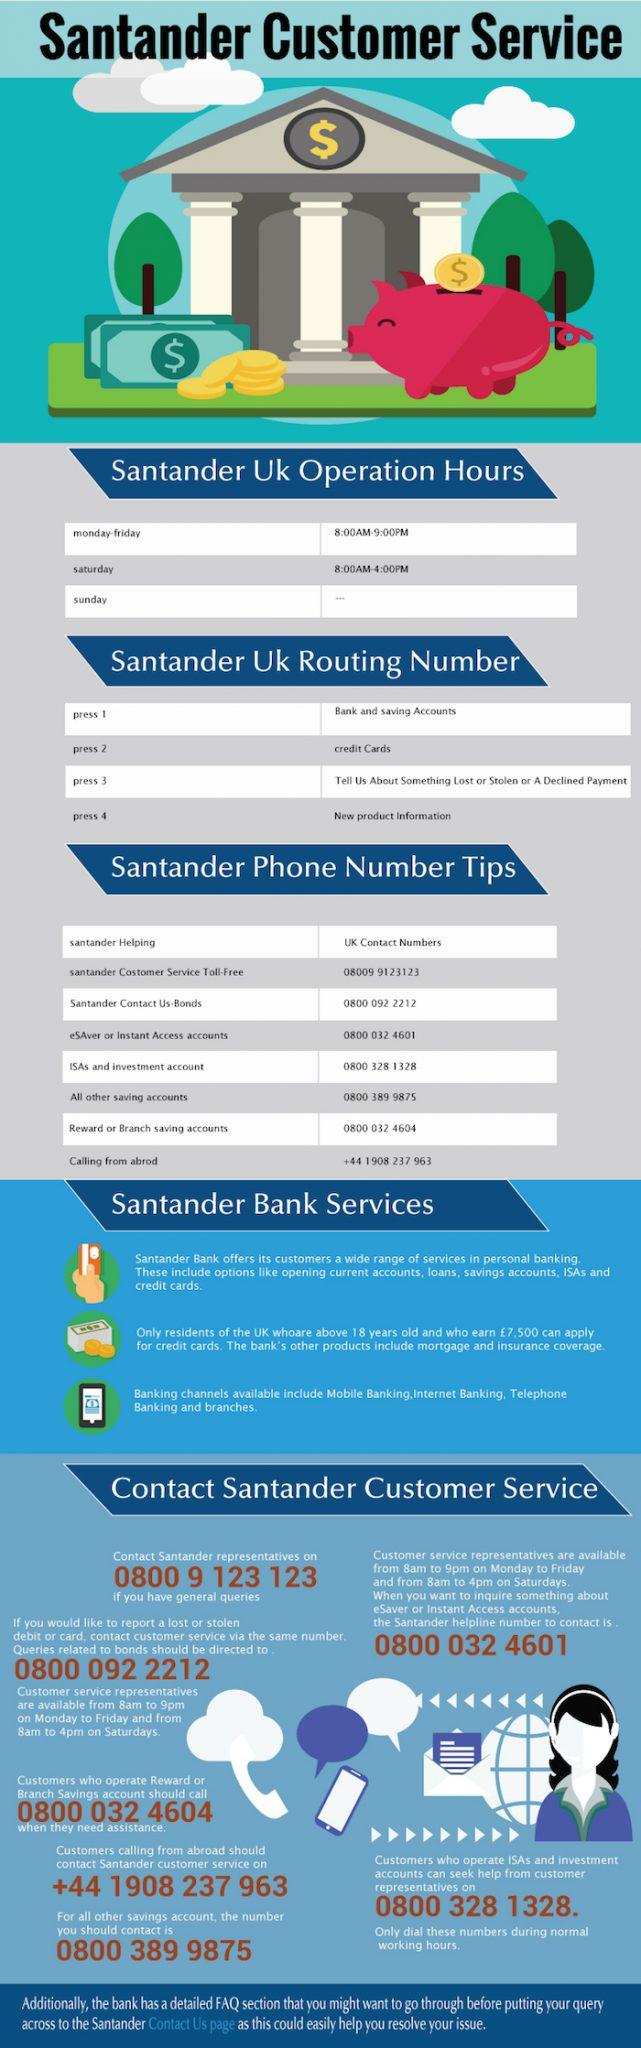 Santander contact numbers UK